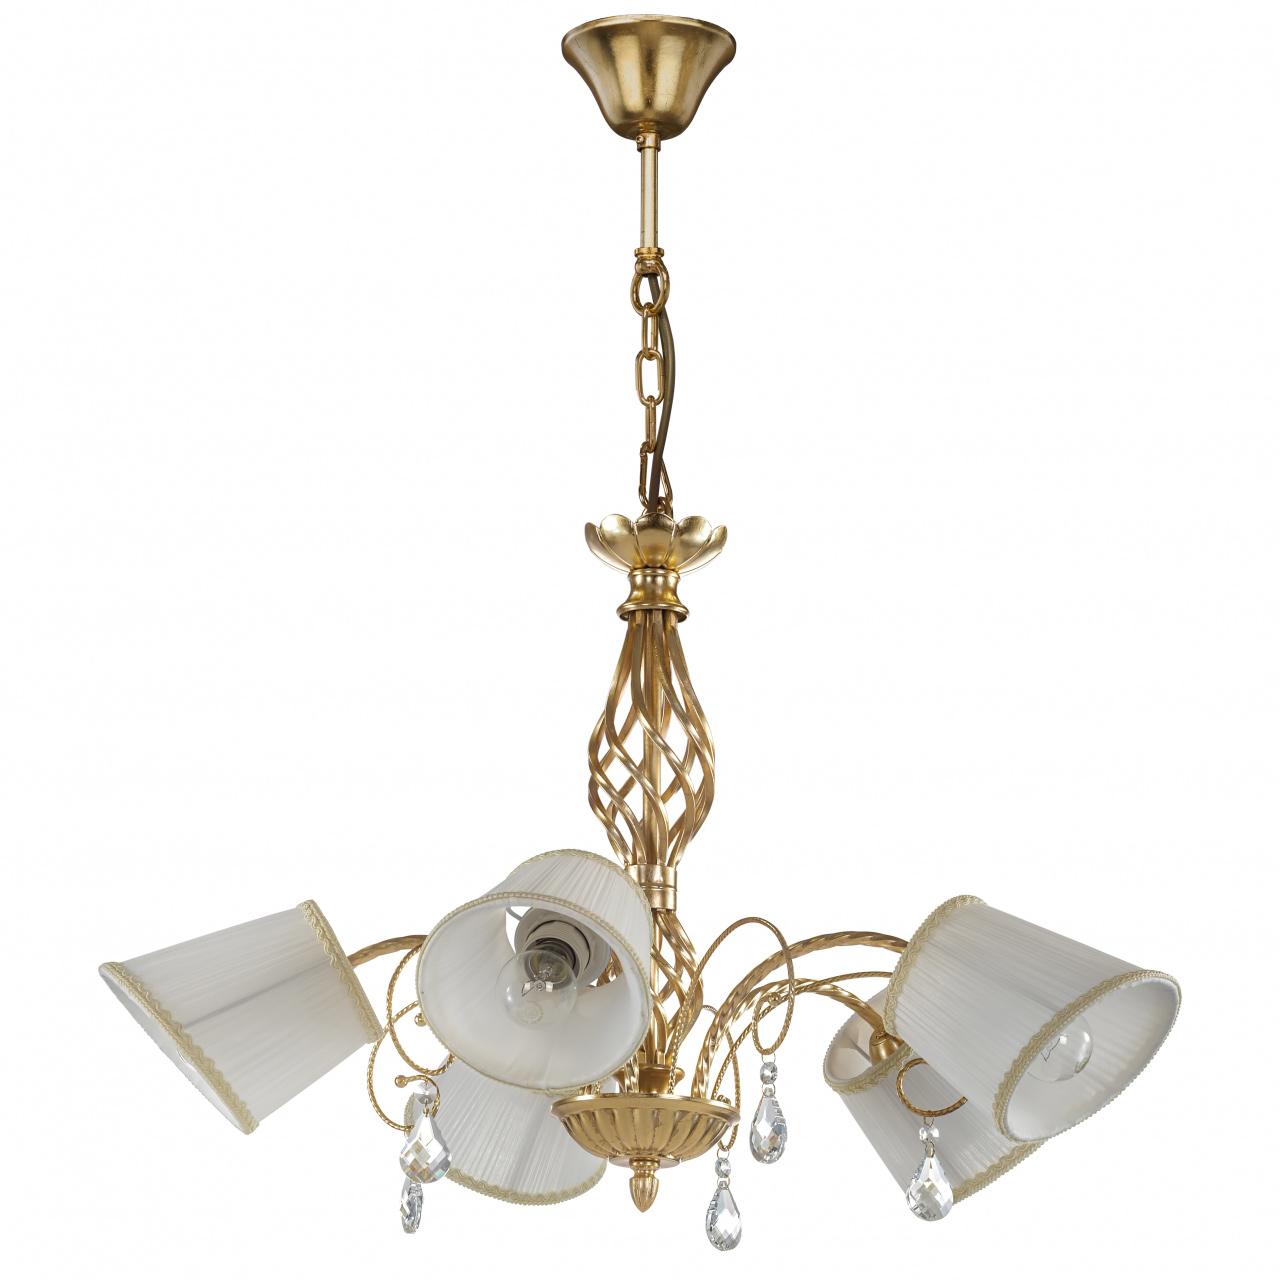 Люстра подвесная Esedra 5x40W E27 gold foil ткань Lightstar 796153